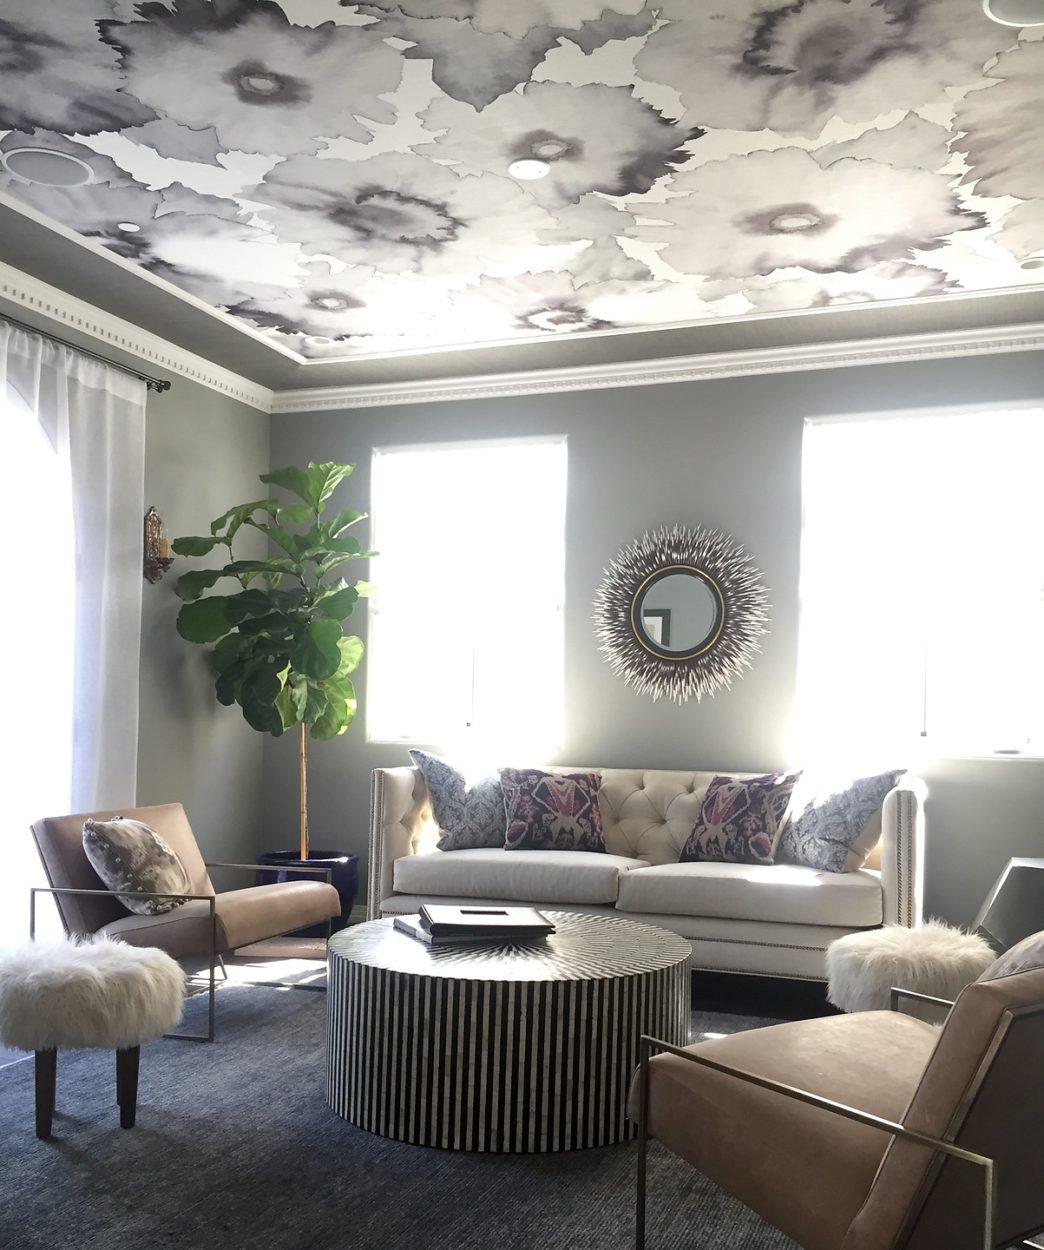 Bedroom Curtains Online Bedroom Ceiling Paint Bedroom Sets Grey Luxury Wallpaper Bedroom: Phillipjeffries-wallcovering